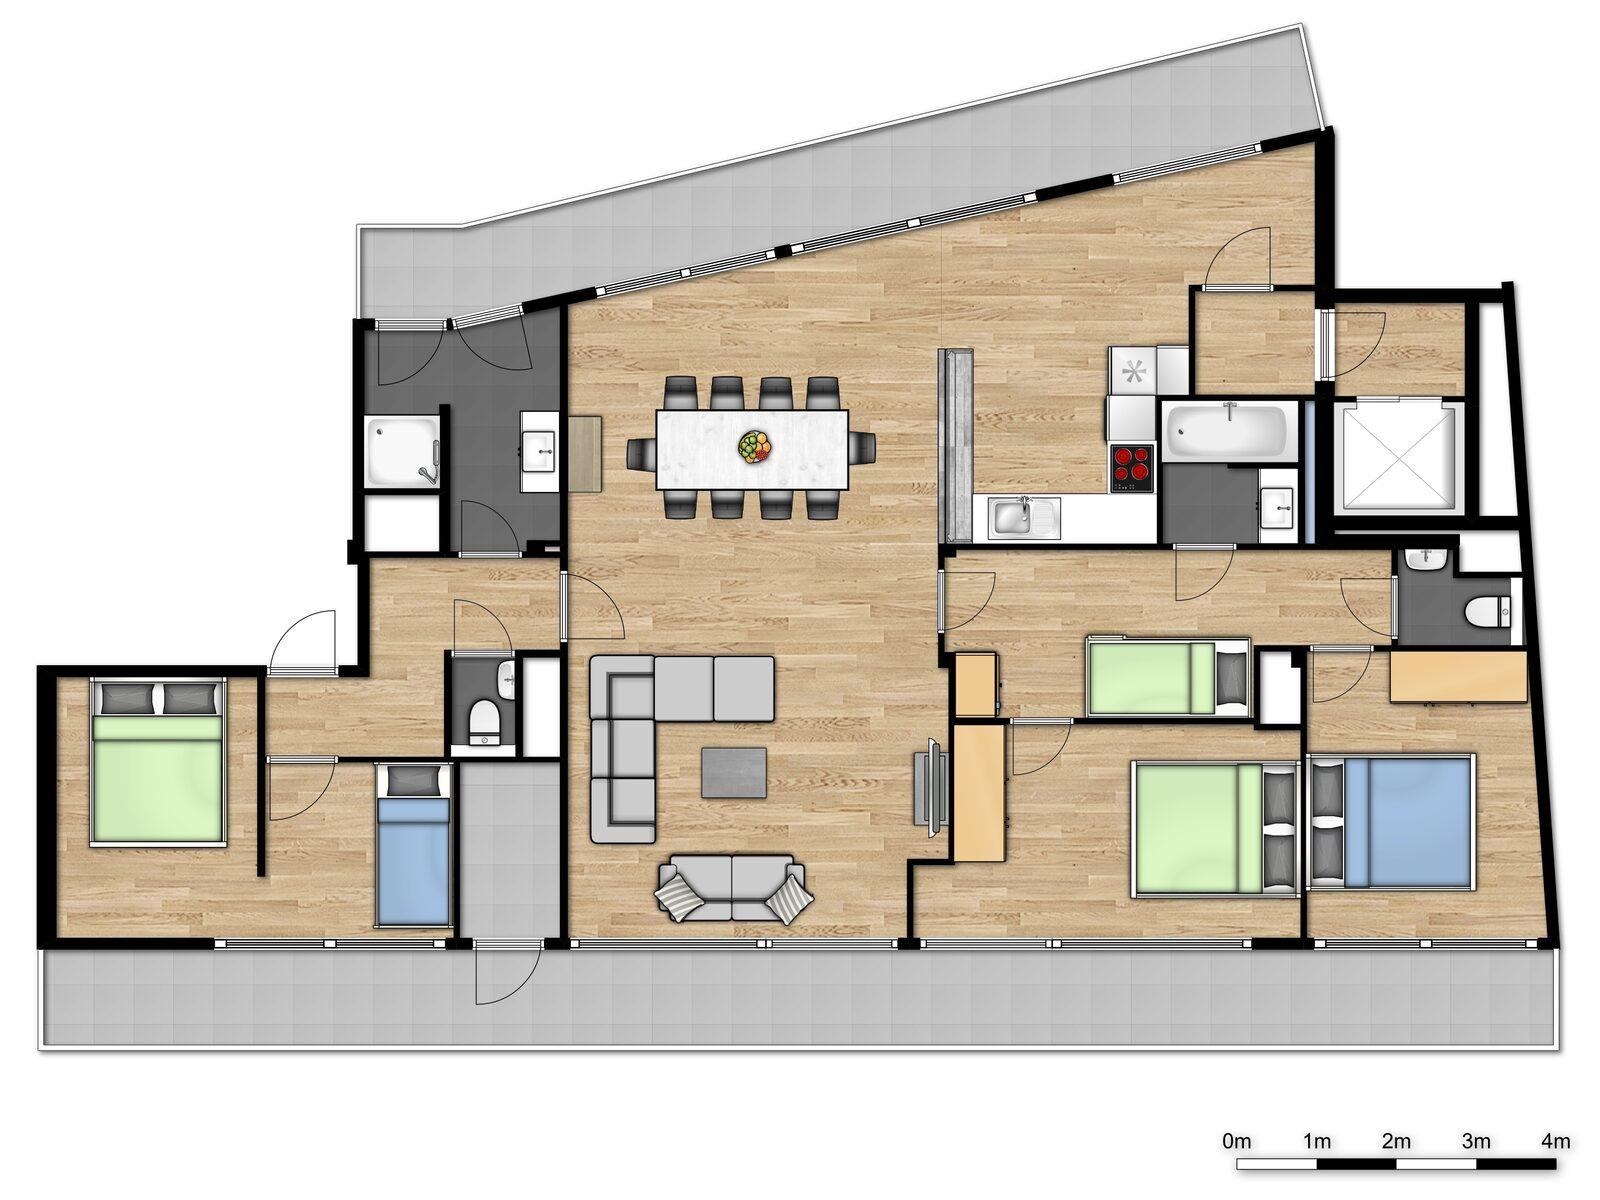 Penthouse - 10p | 3 Bedrooms - Sleeping corner | Rooftop terrace - Sea view